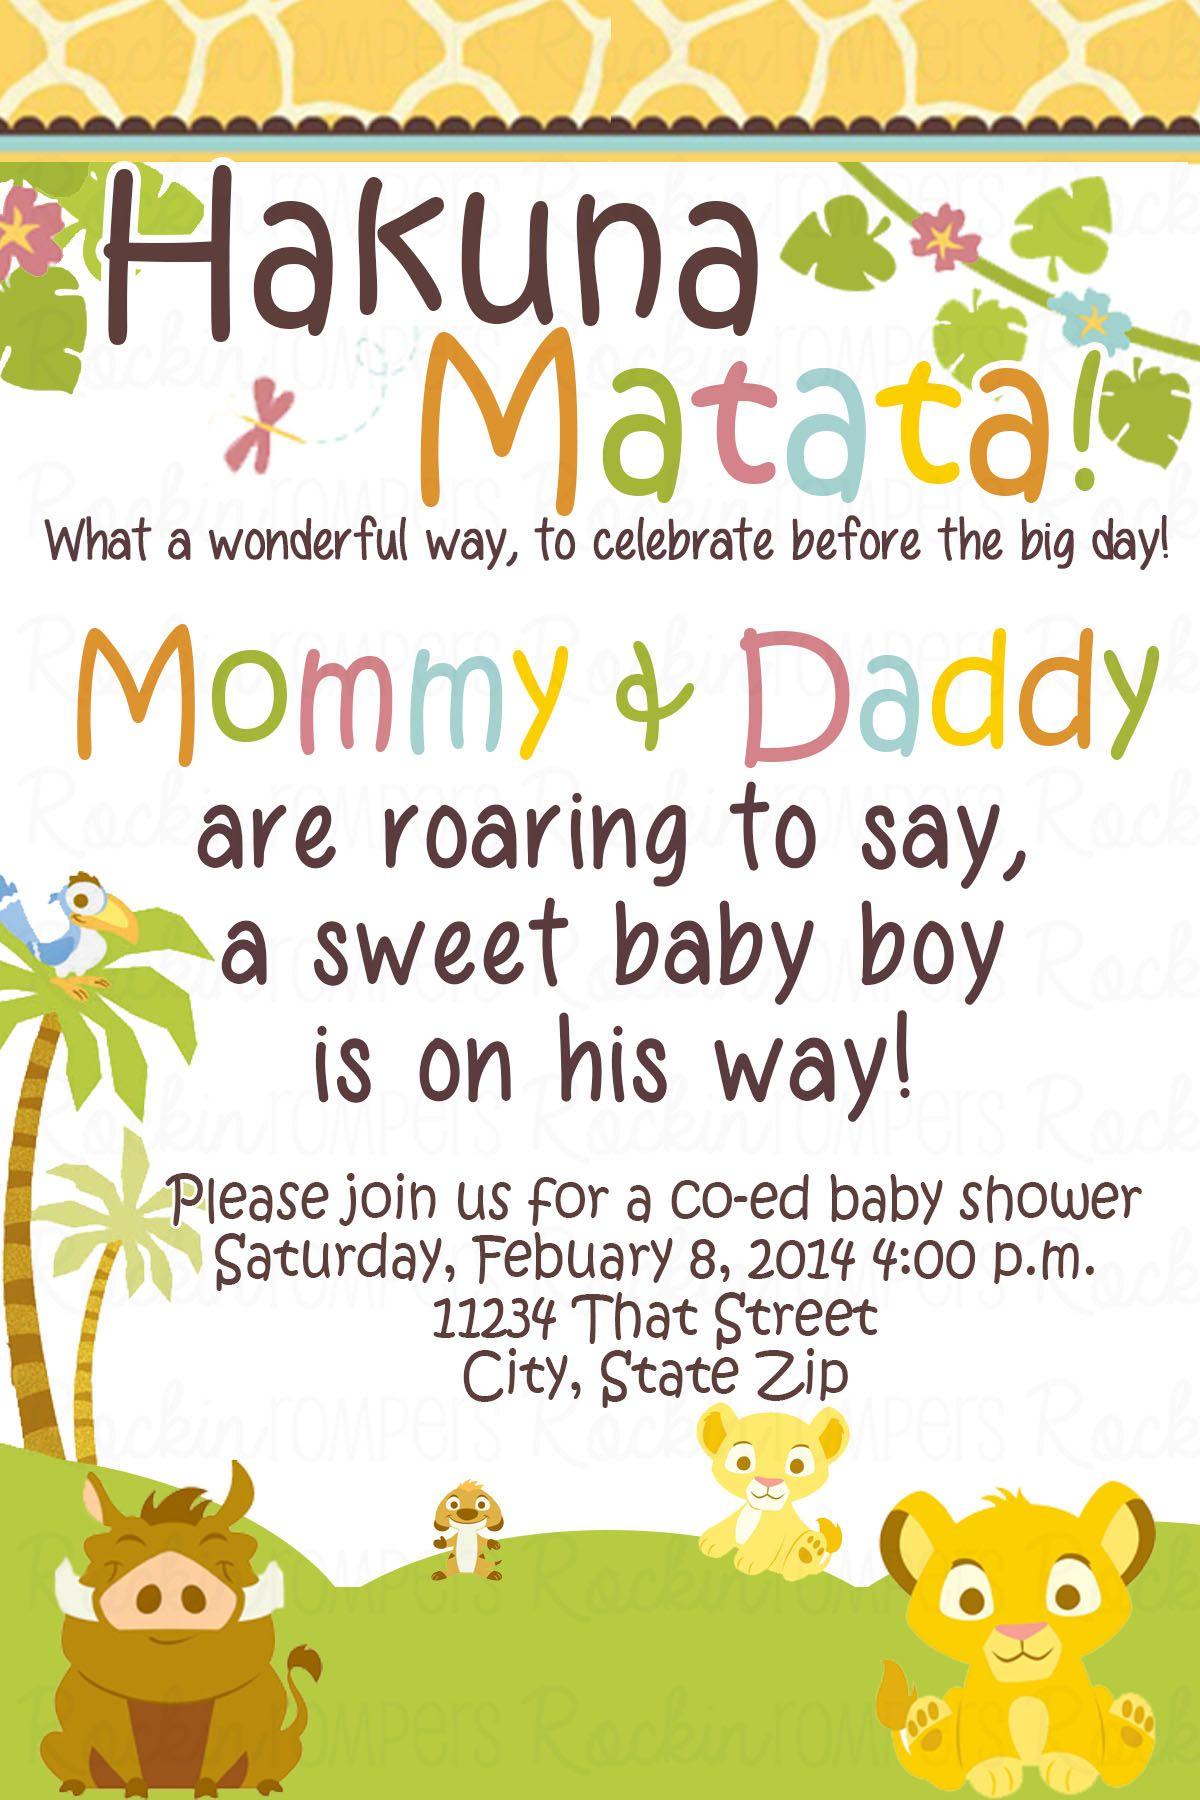 Lion King Baby Shower Invitation Www.facebook.com/rockinrompers Www.etsy.